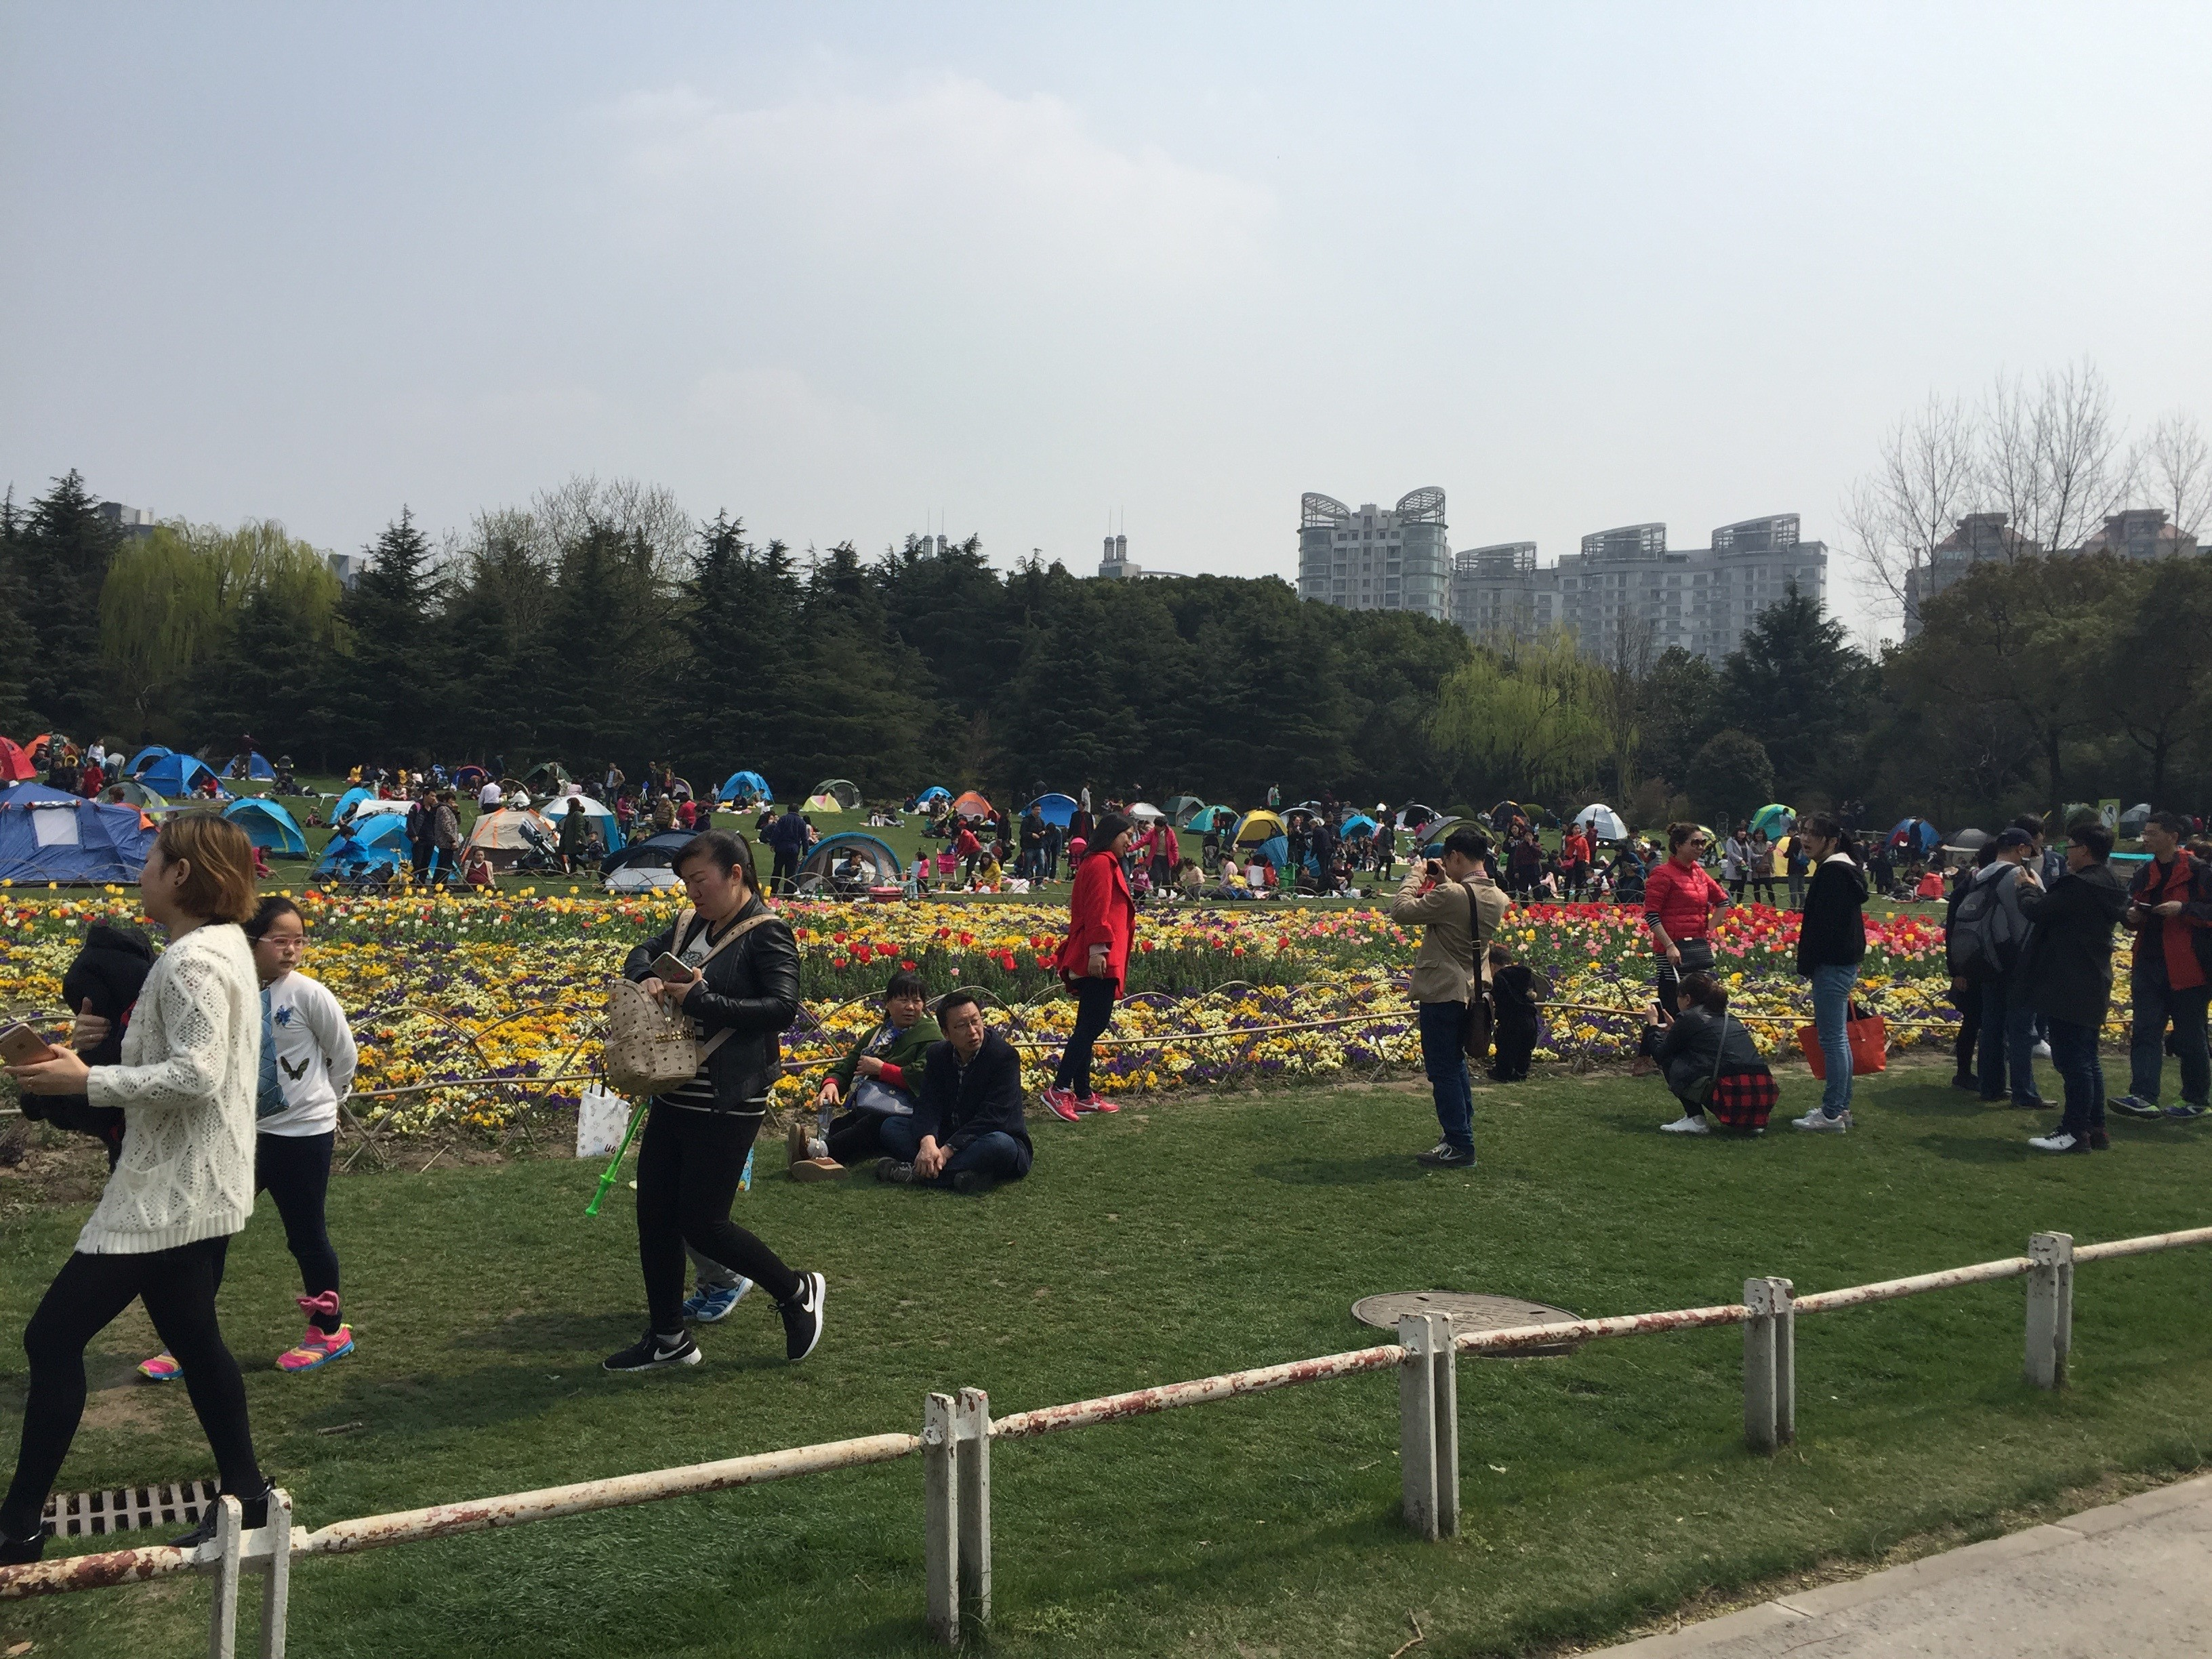 CAPAStudyAbroad_Shanghai_Spring2017_From Danielle Thai Parks 1.jpg